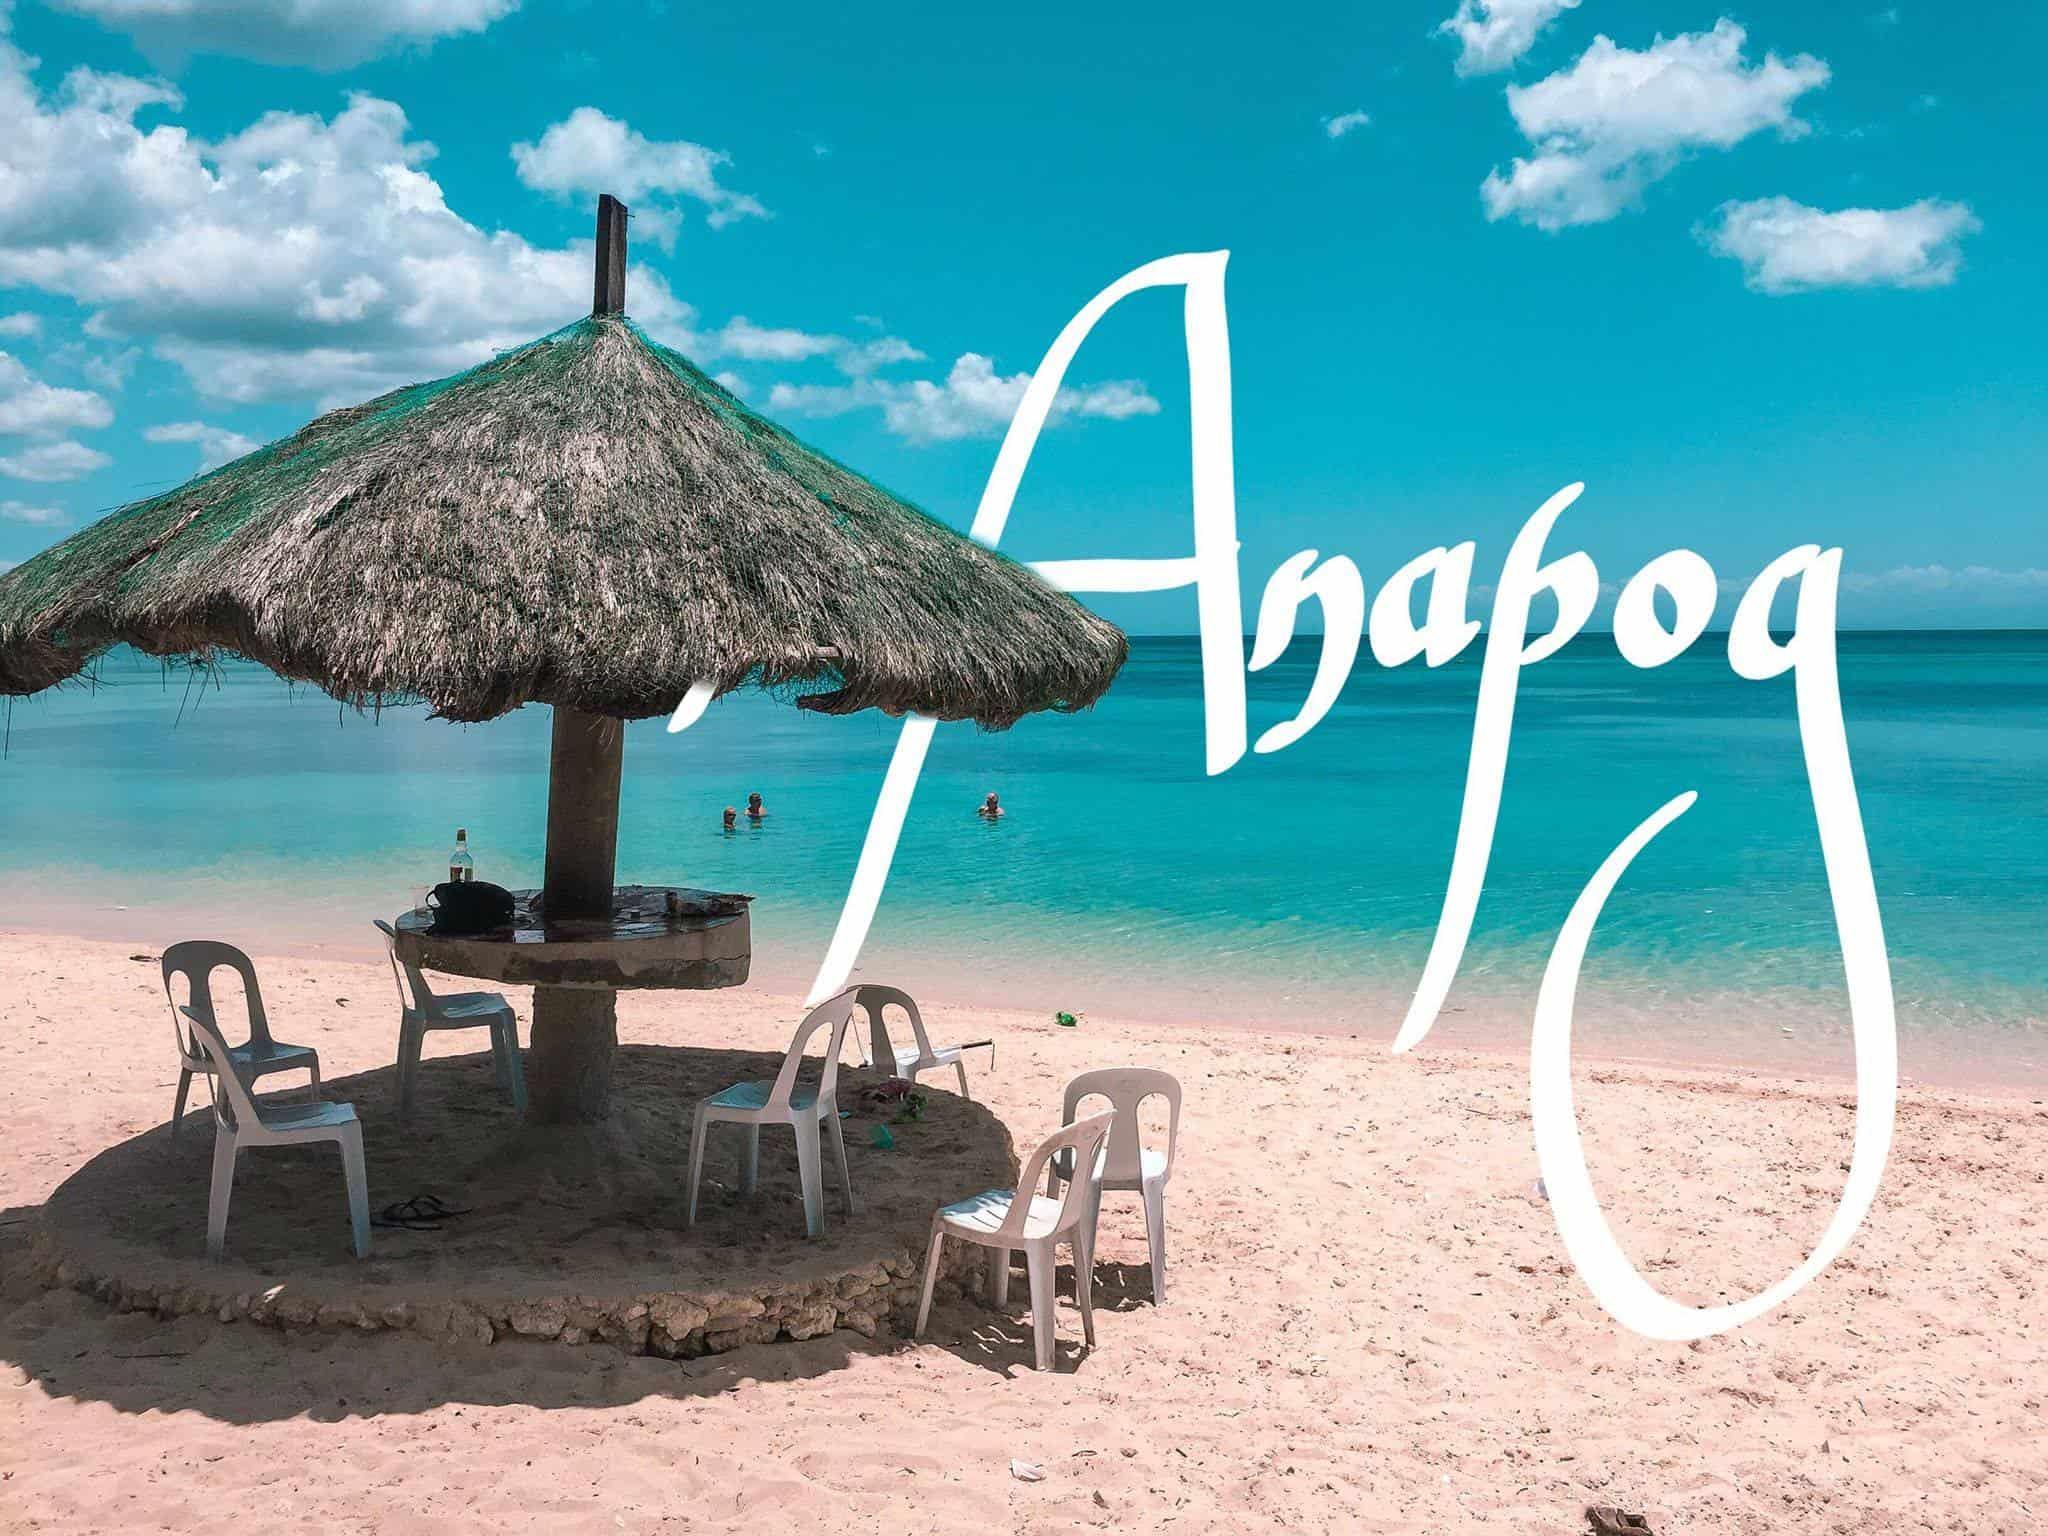 Orongan Beach Resort Anapog San Remigio (1)